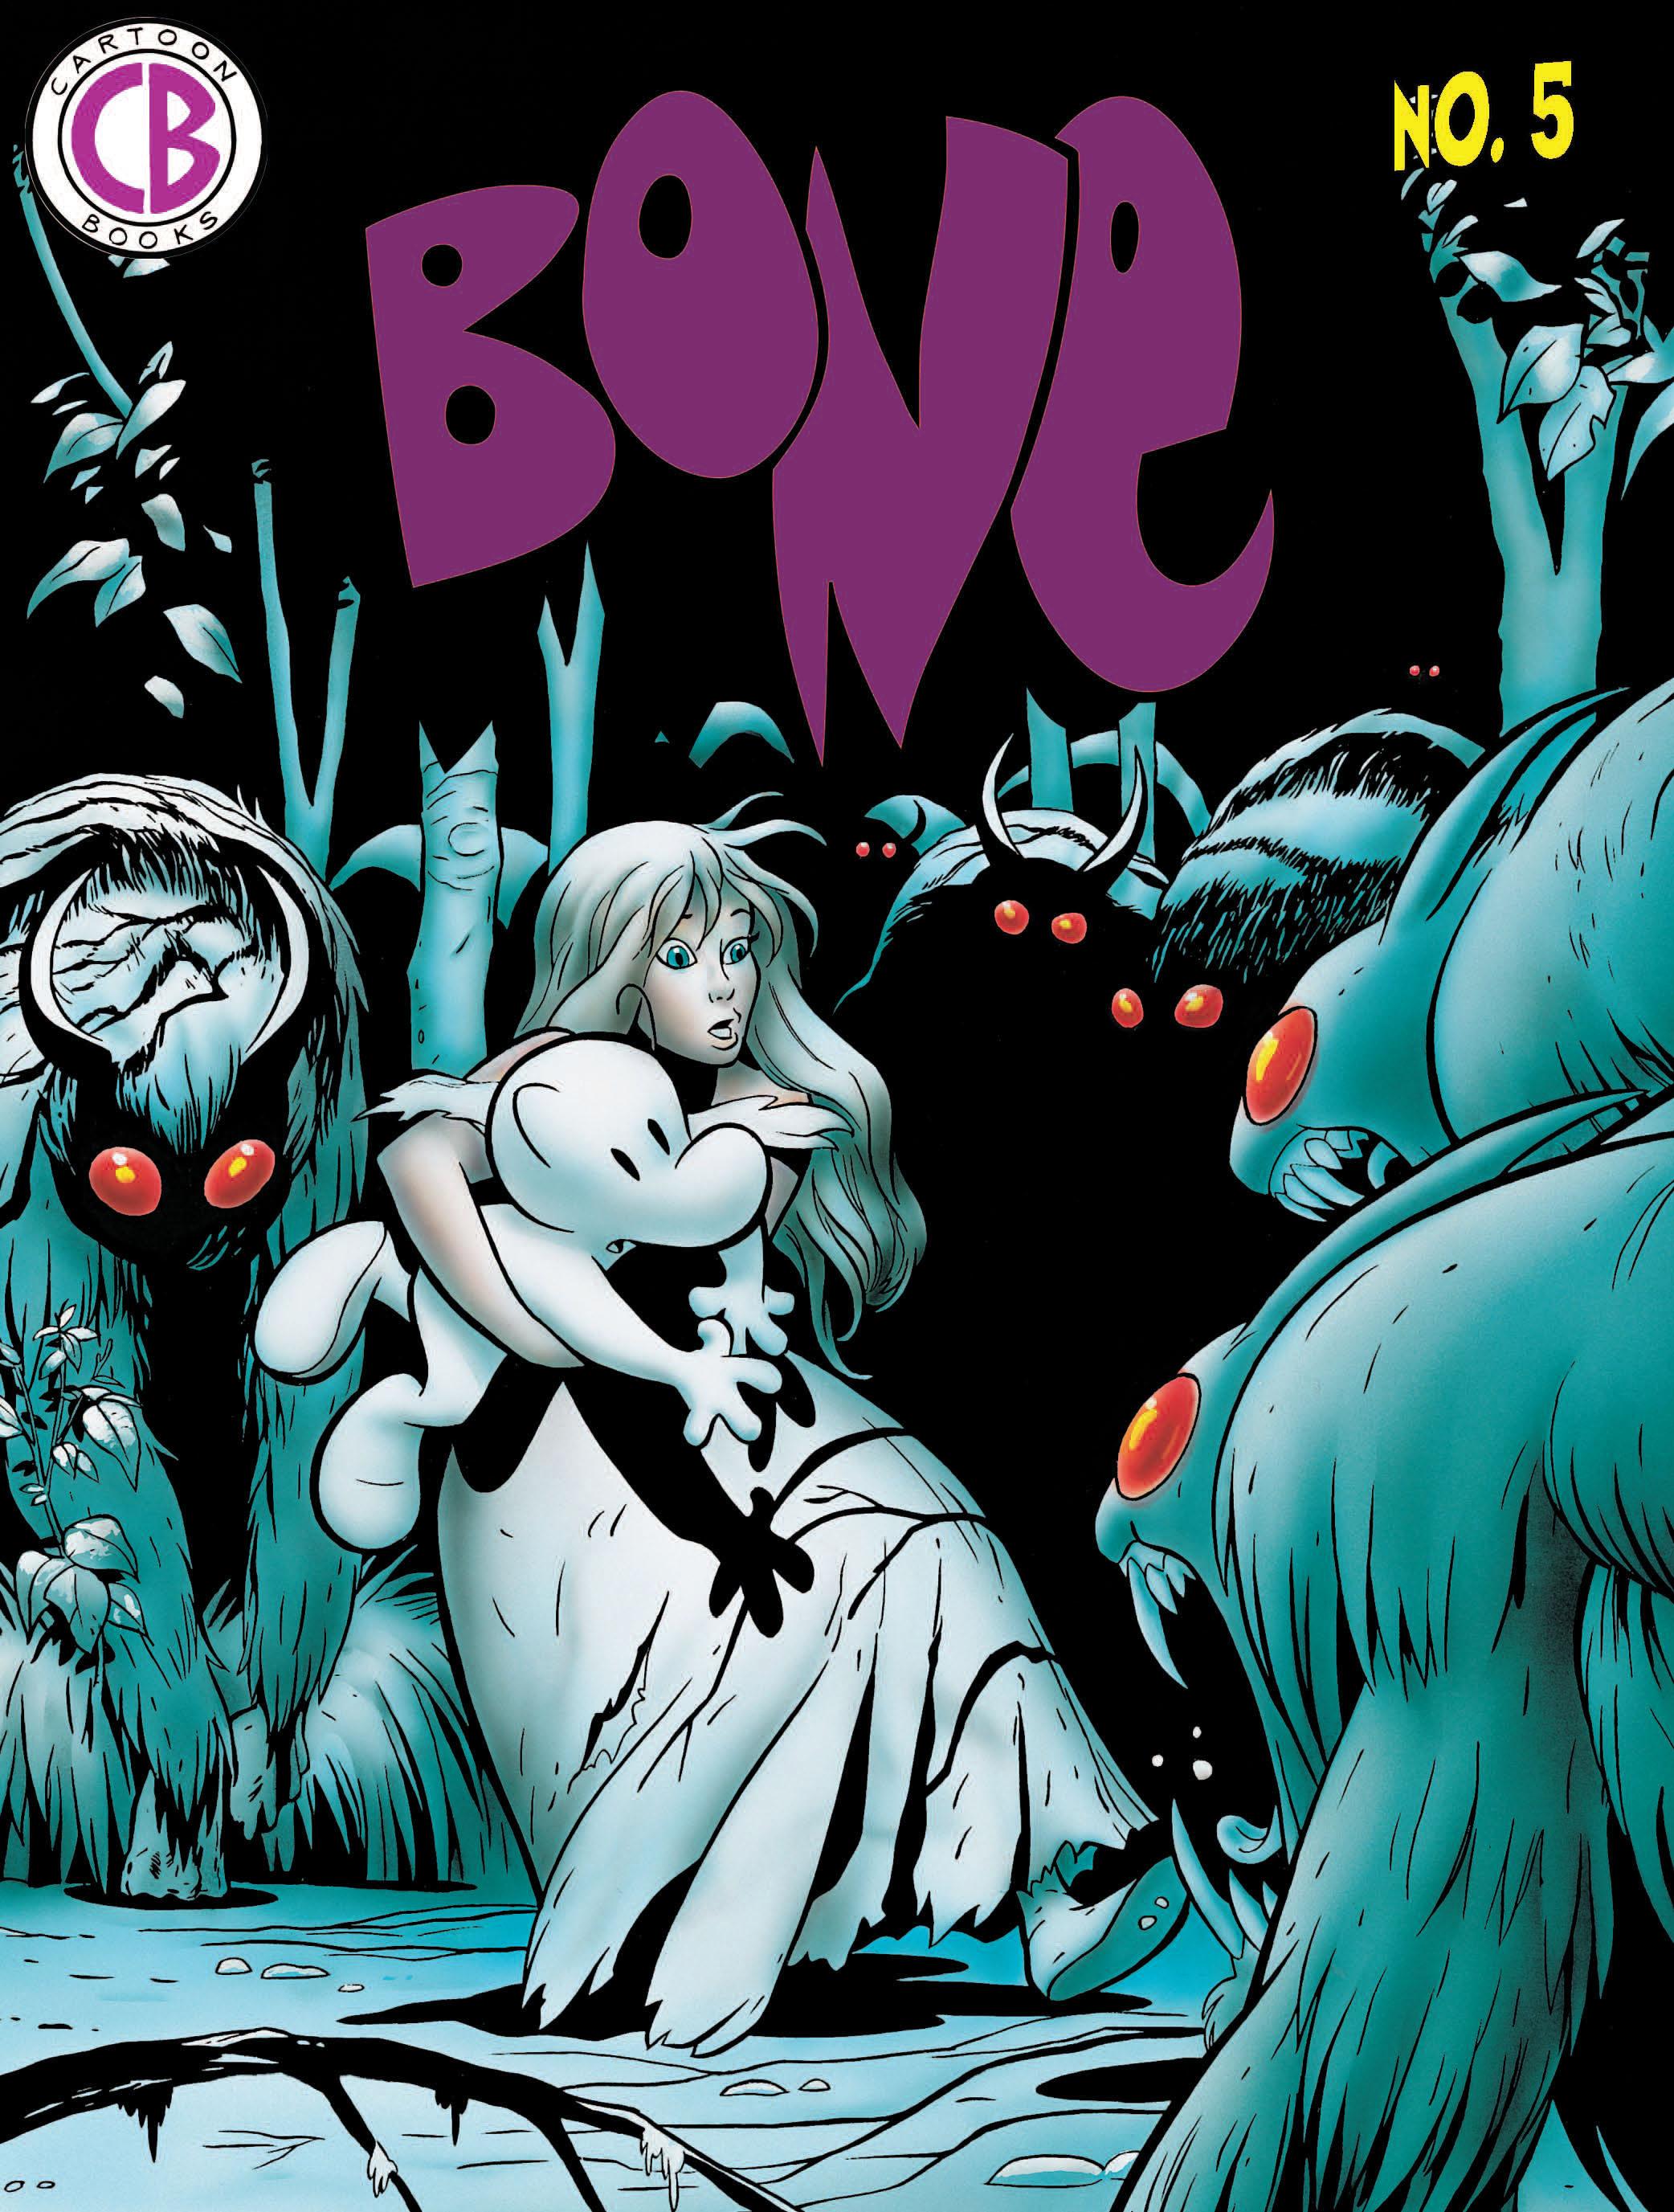 Bone 1991 Issue 5